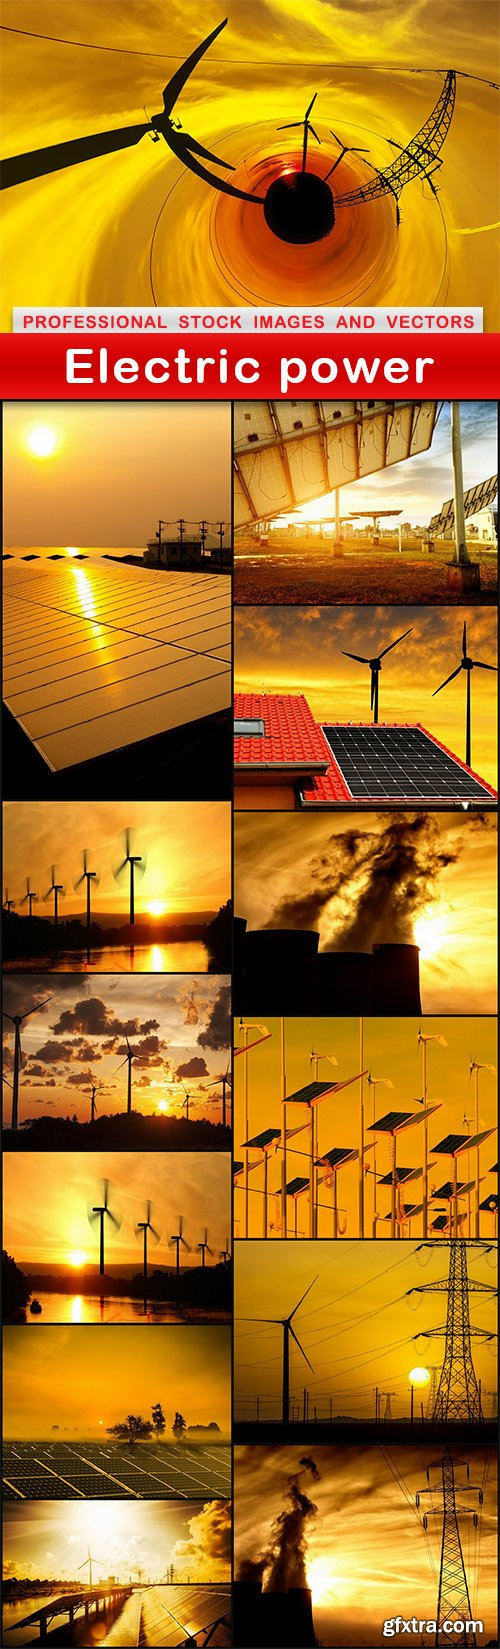 Electric power - 13 UHQ JPEG